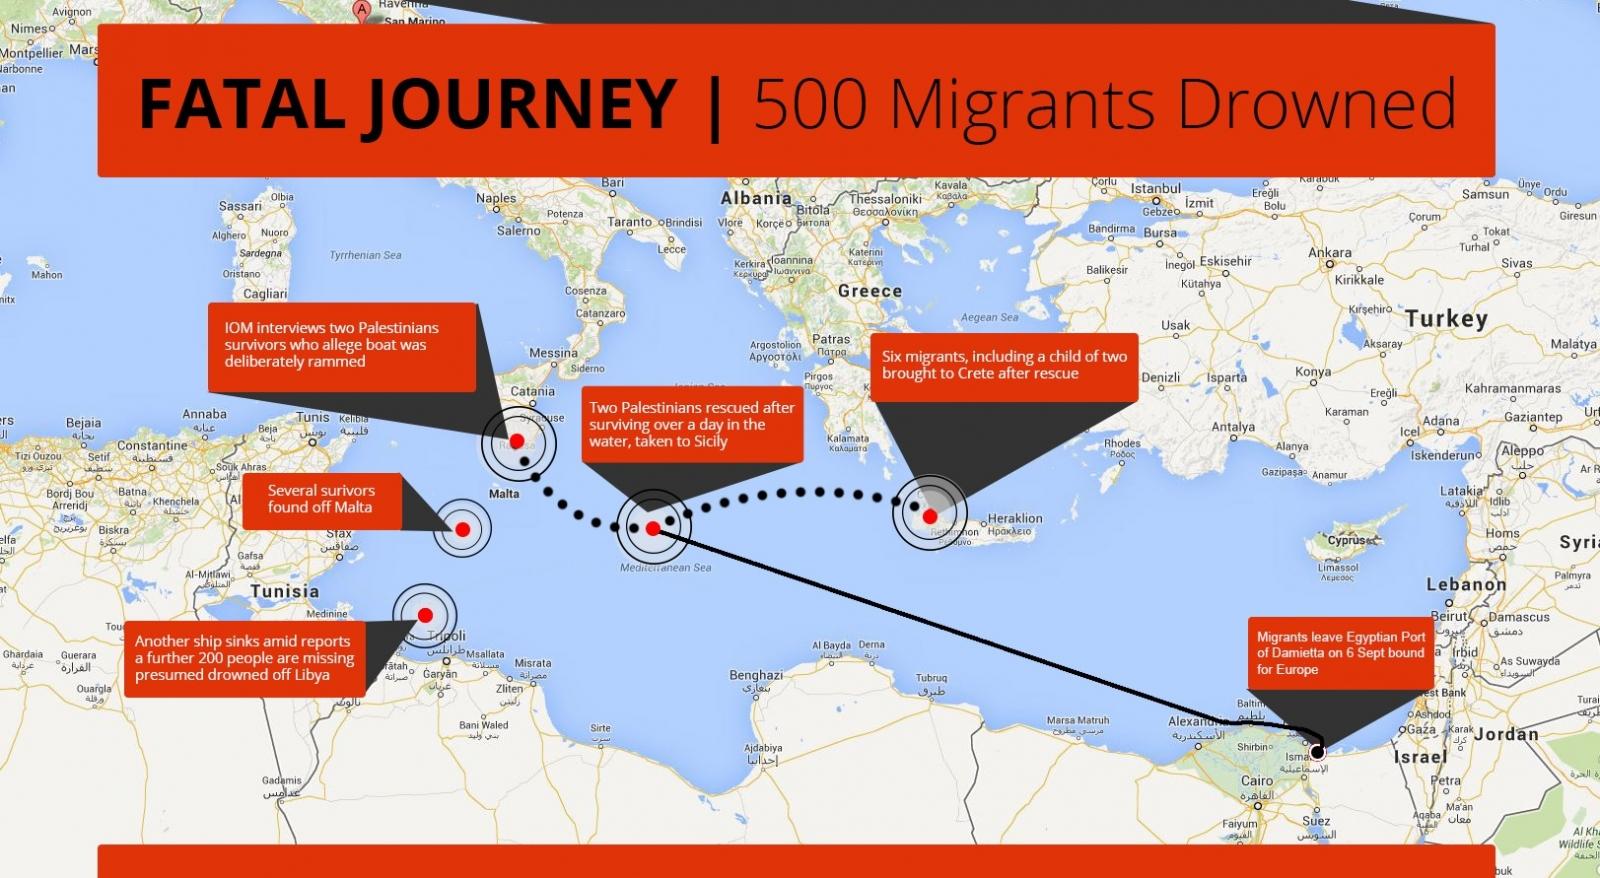 Mediterranean Migrants Boat Incident 500 die